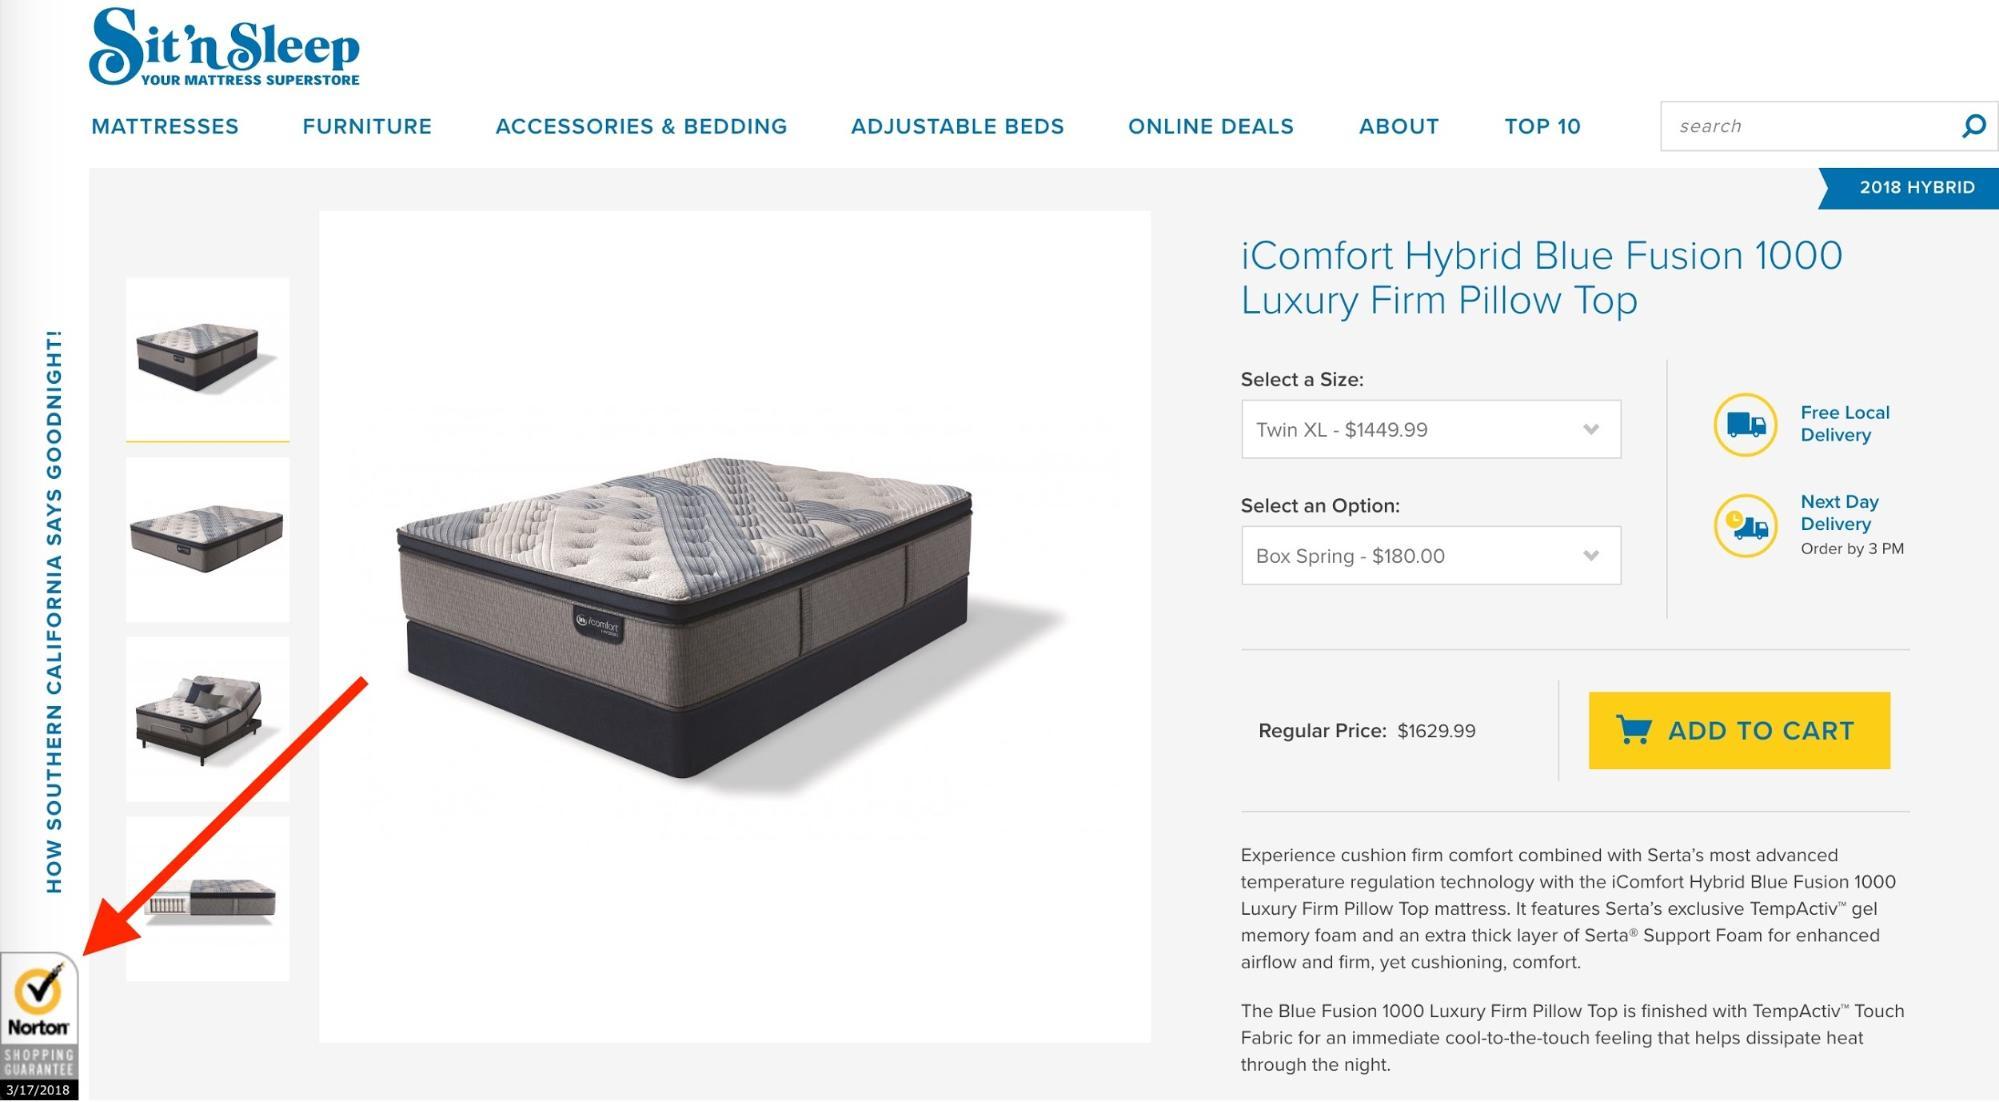 Screenshot showing a bed